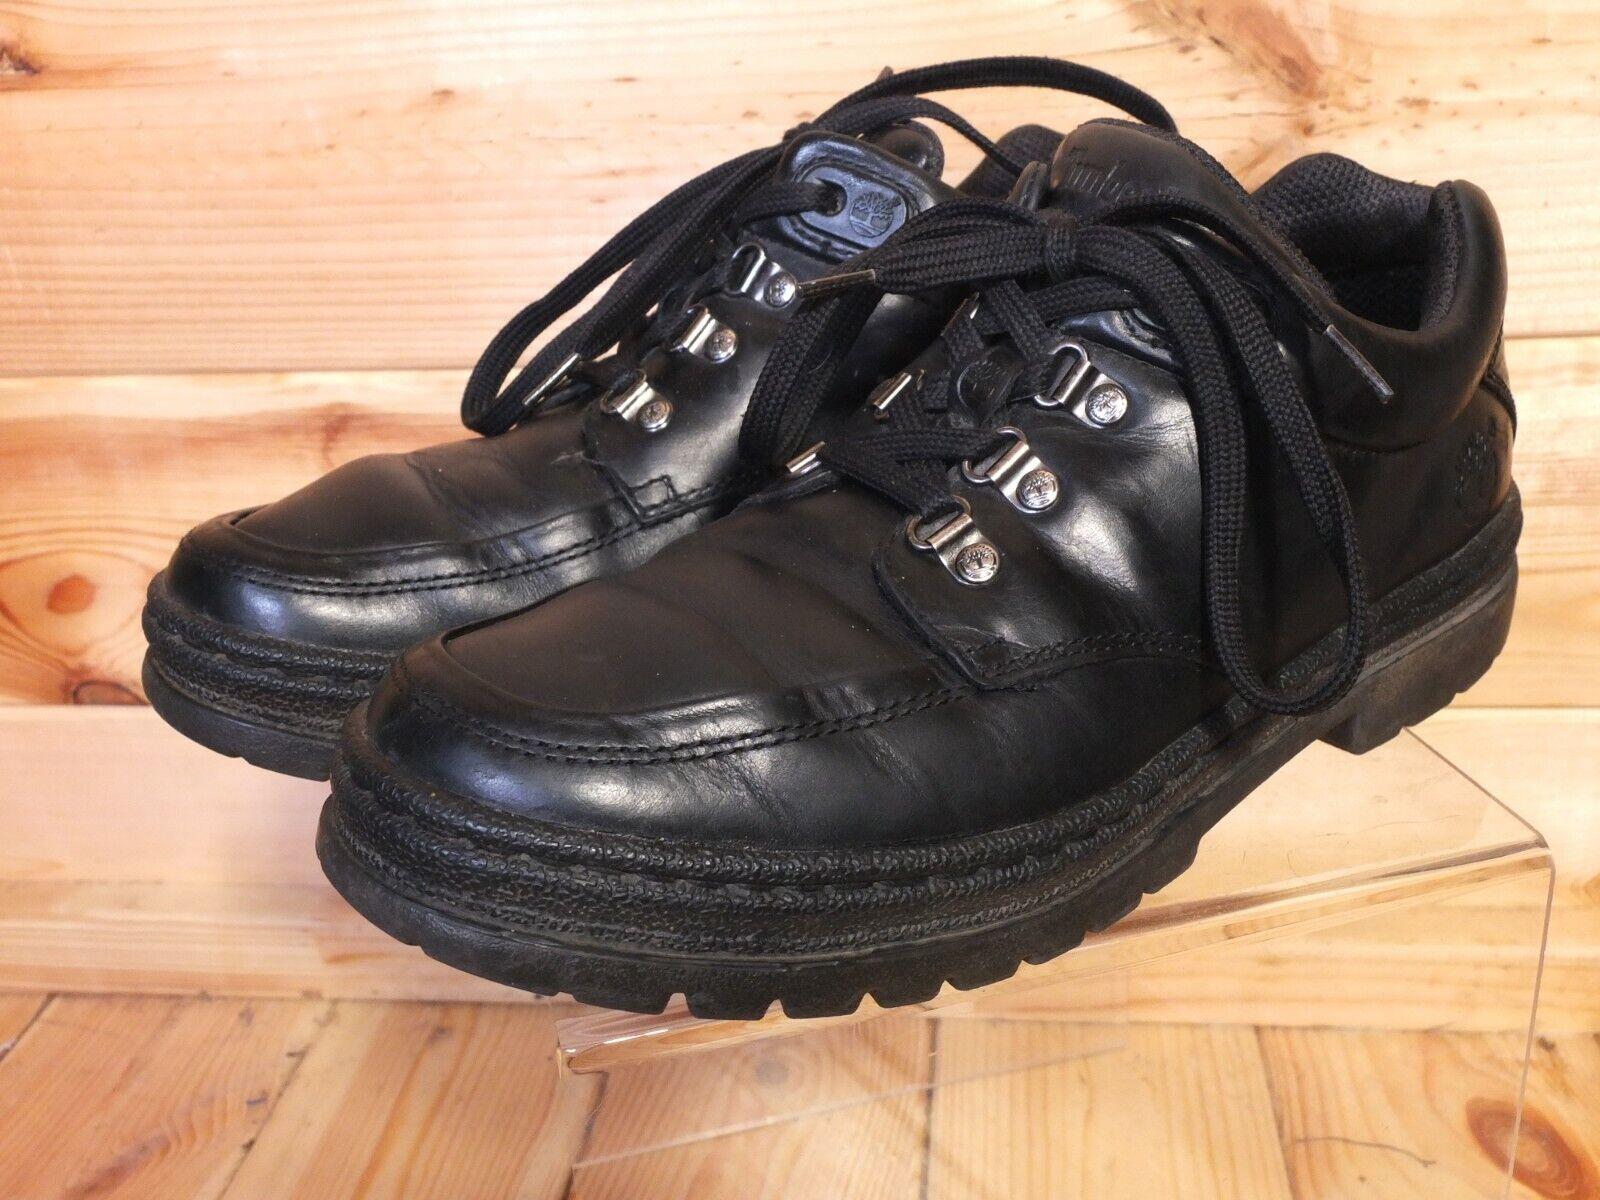 Timberland Black Leather Retro Hiking Walk Boots Shoes UK 8.5